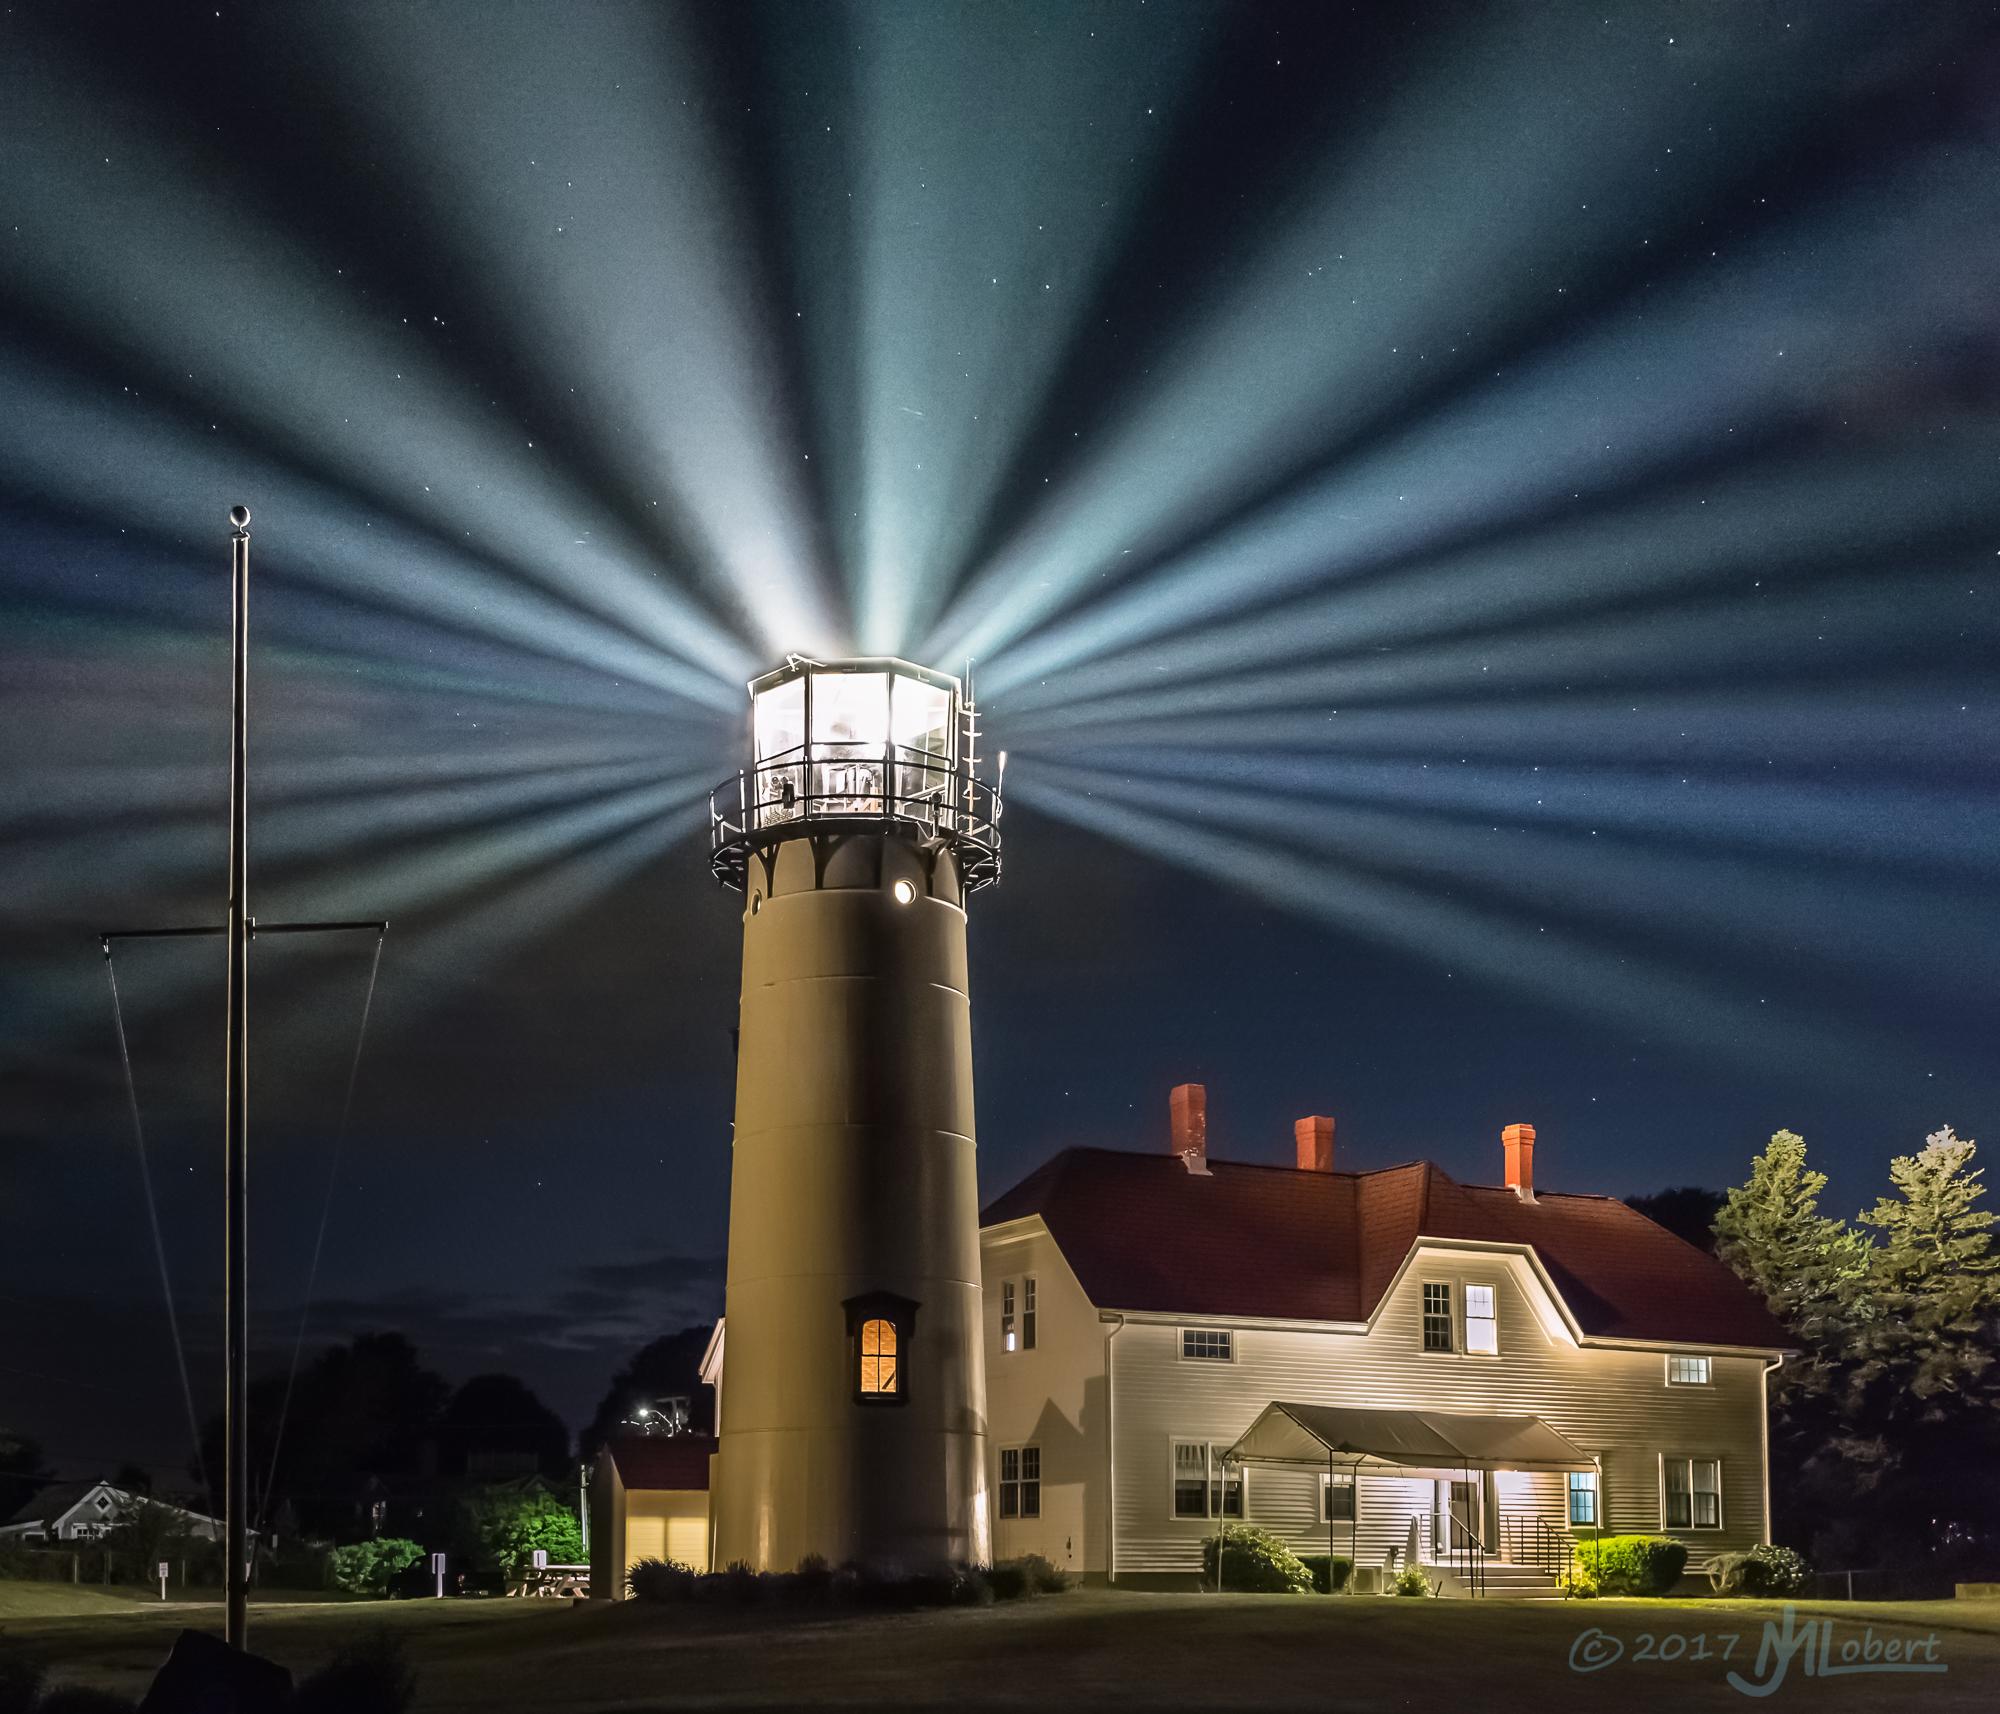 Chatham Lighthouse, Chatham, MA, USA